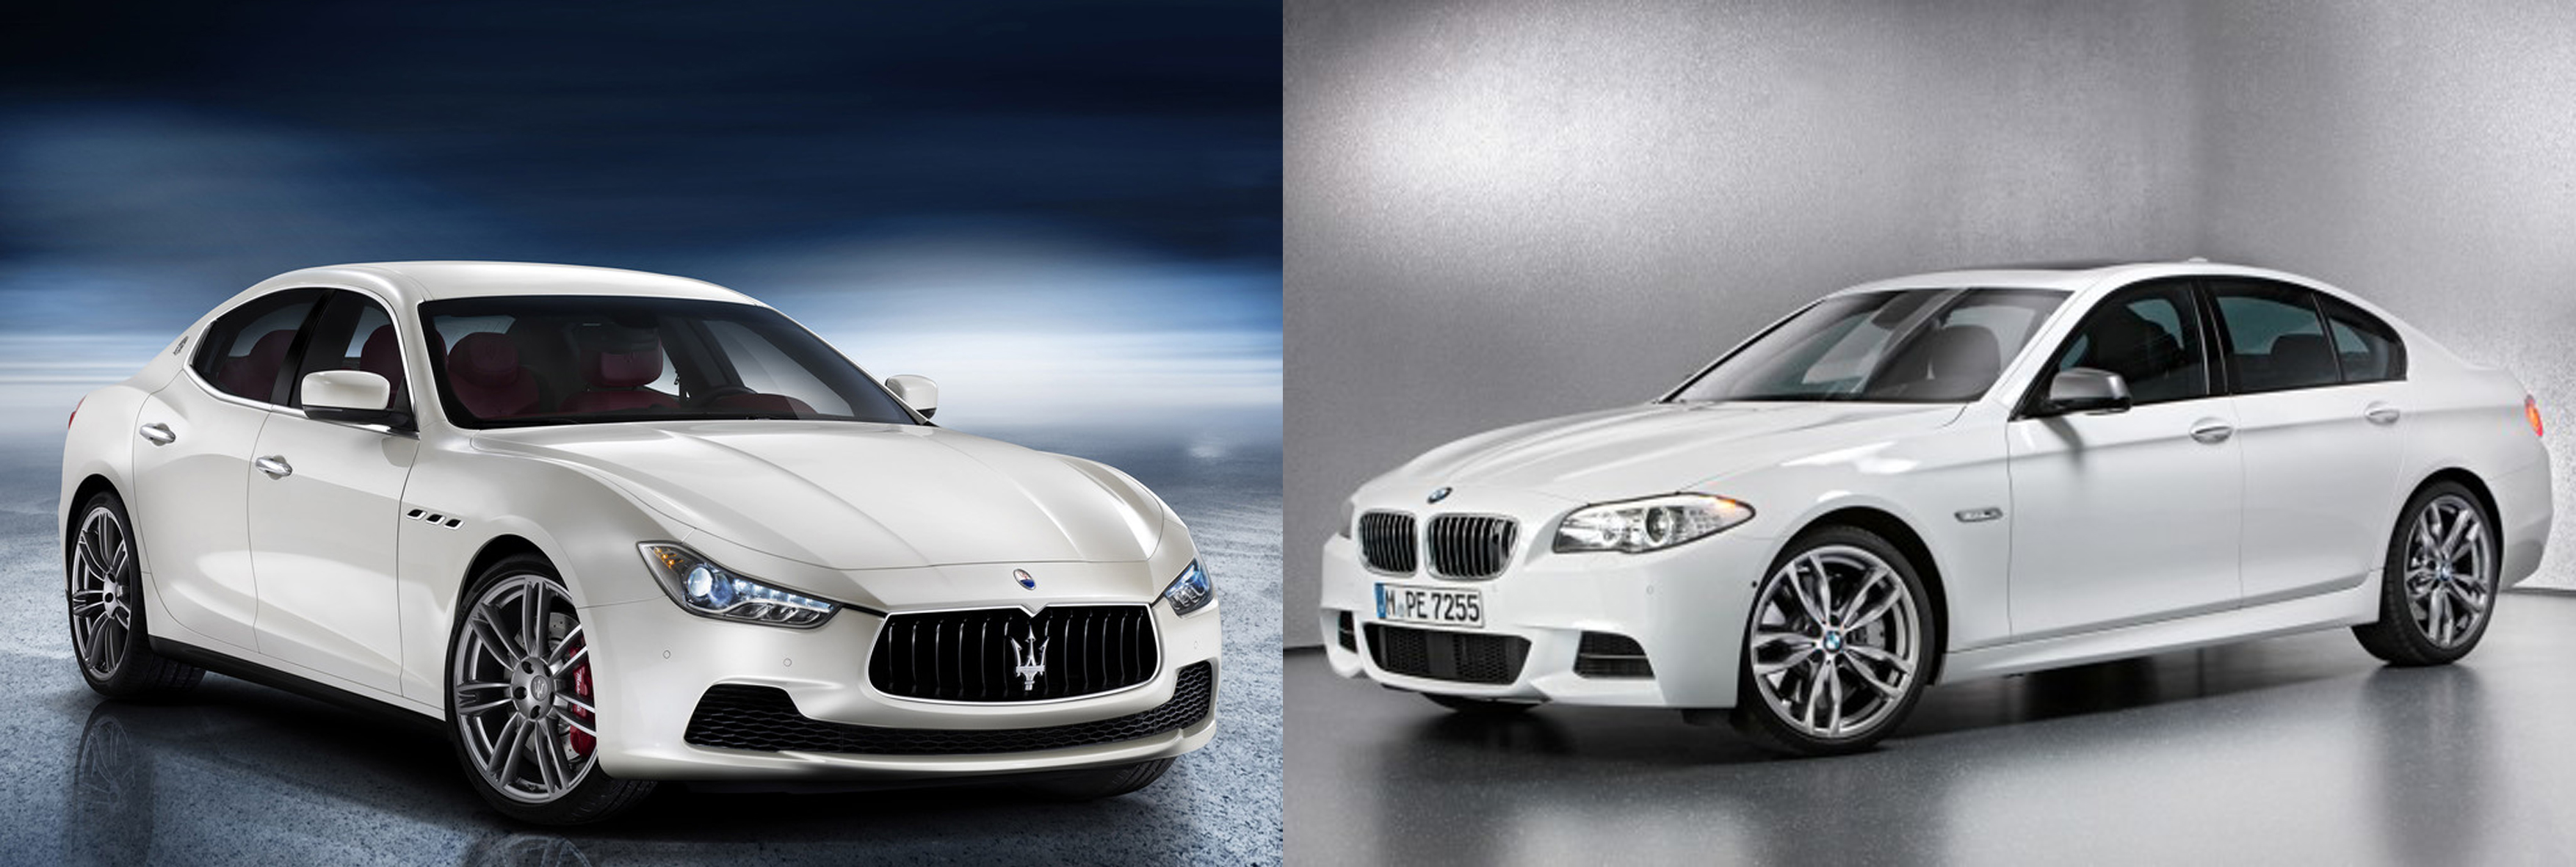 Maserati Ghibli Or Bmw 5 Series Fiat Group S World